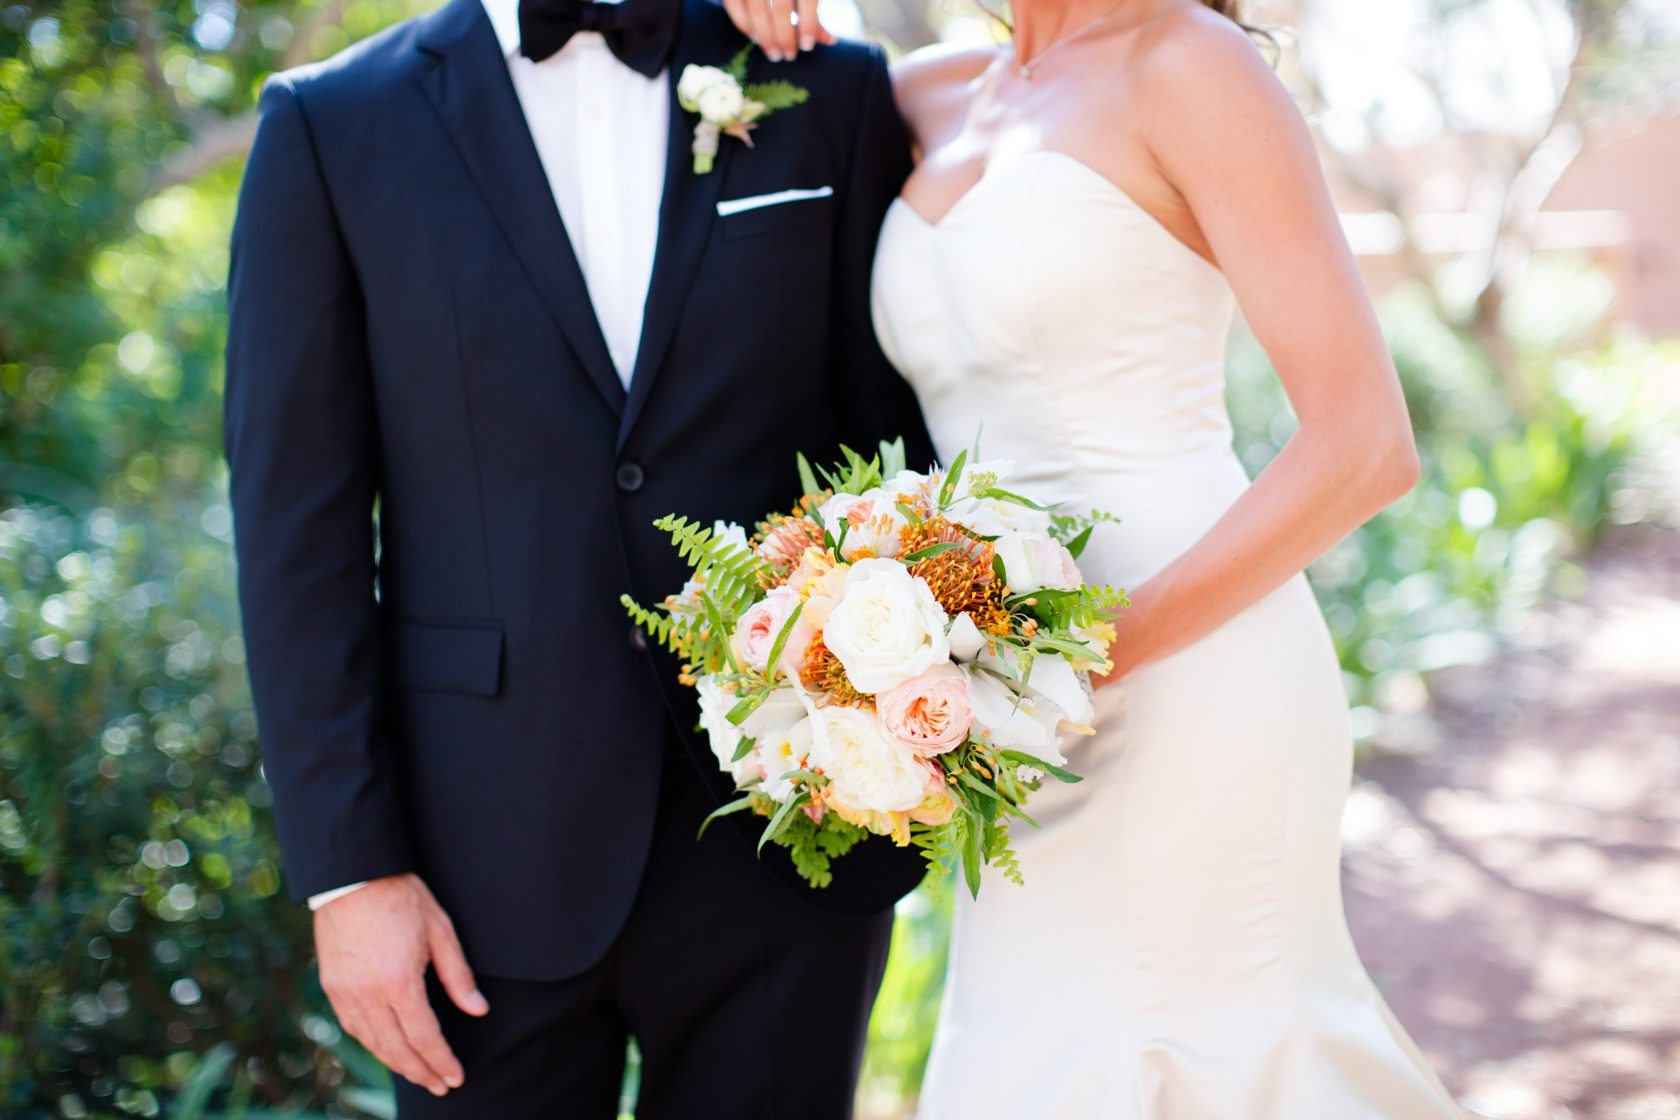 Rancho_Valencia_Resort_Wedding_016-1680x1120.jpg